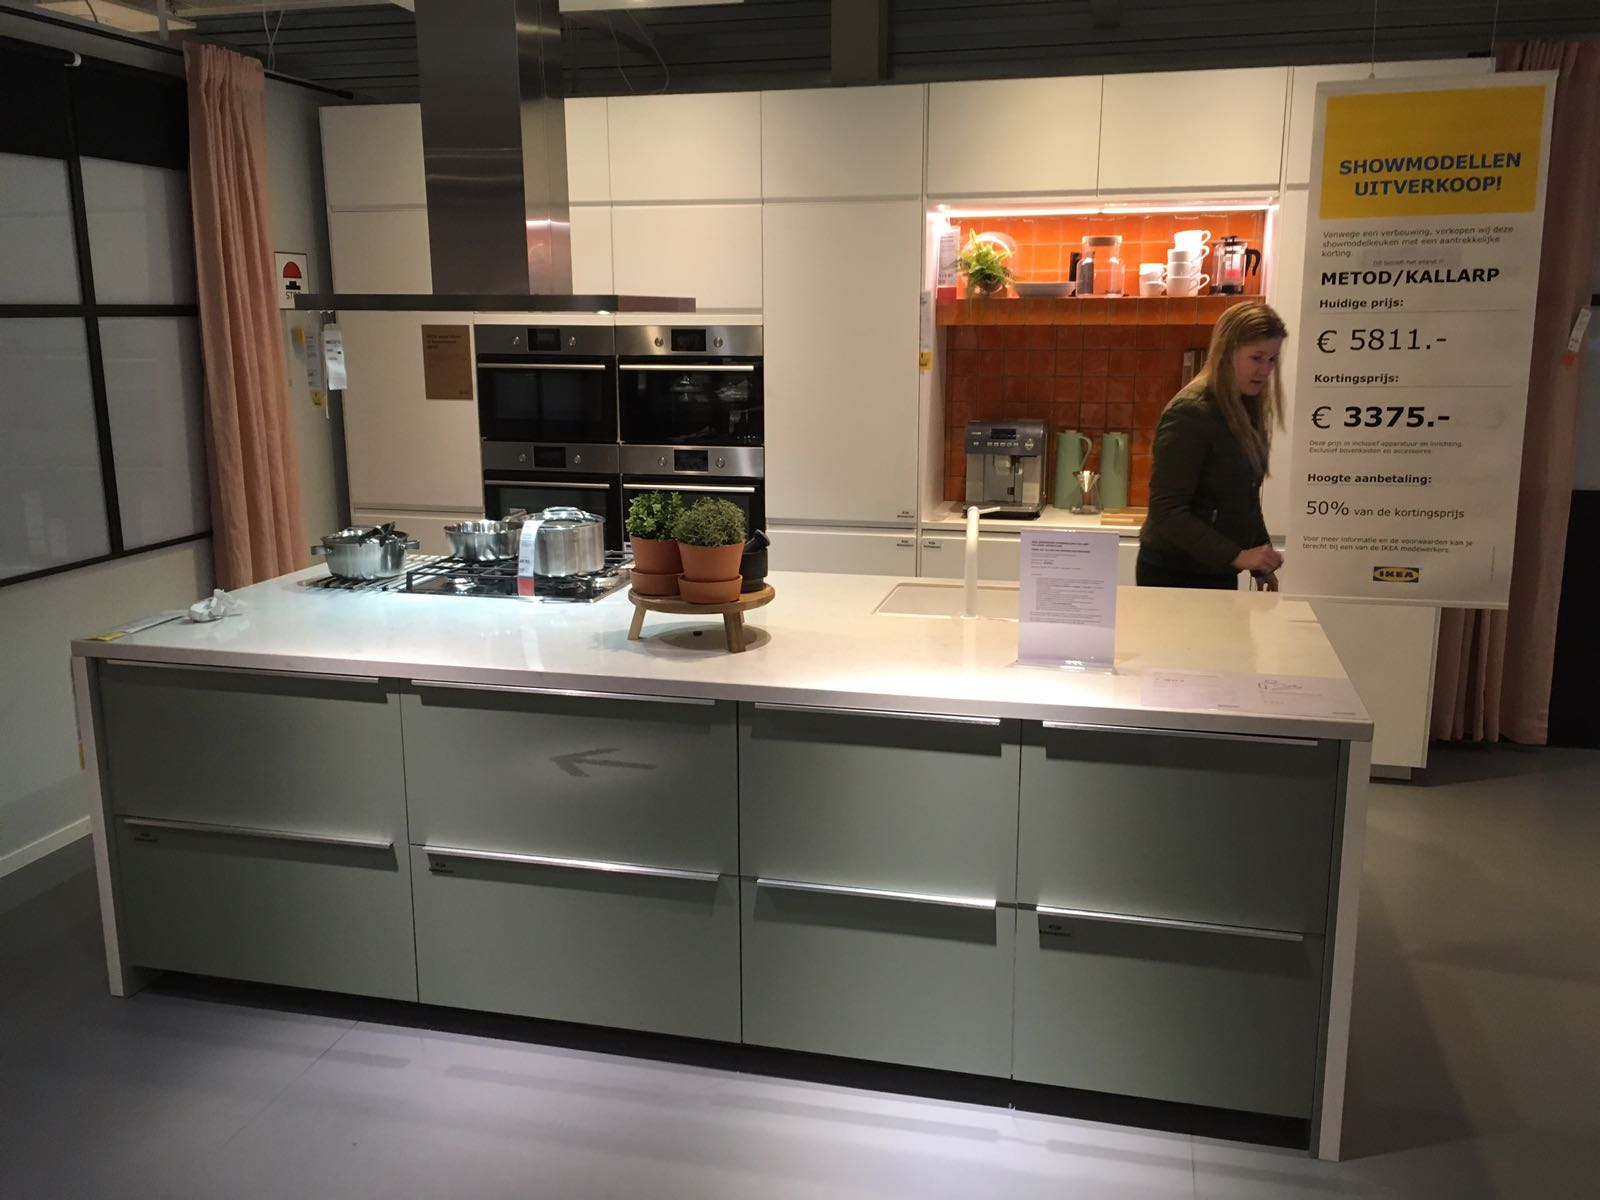 Keuken Ikea Prijs : Showroom keuken ikea gekocht financefitgirl